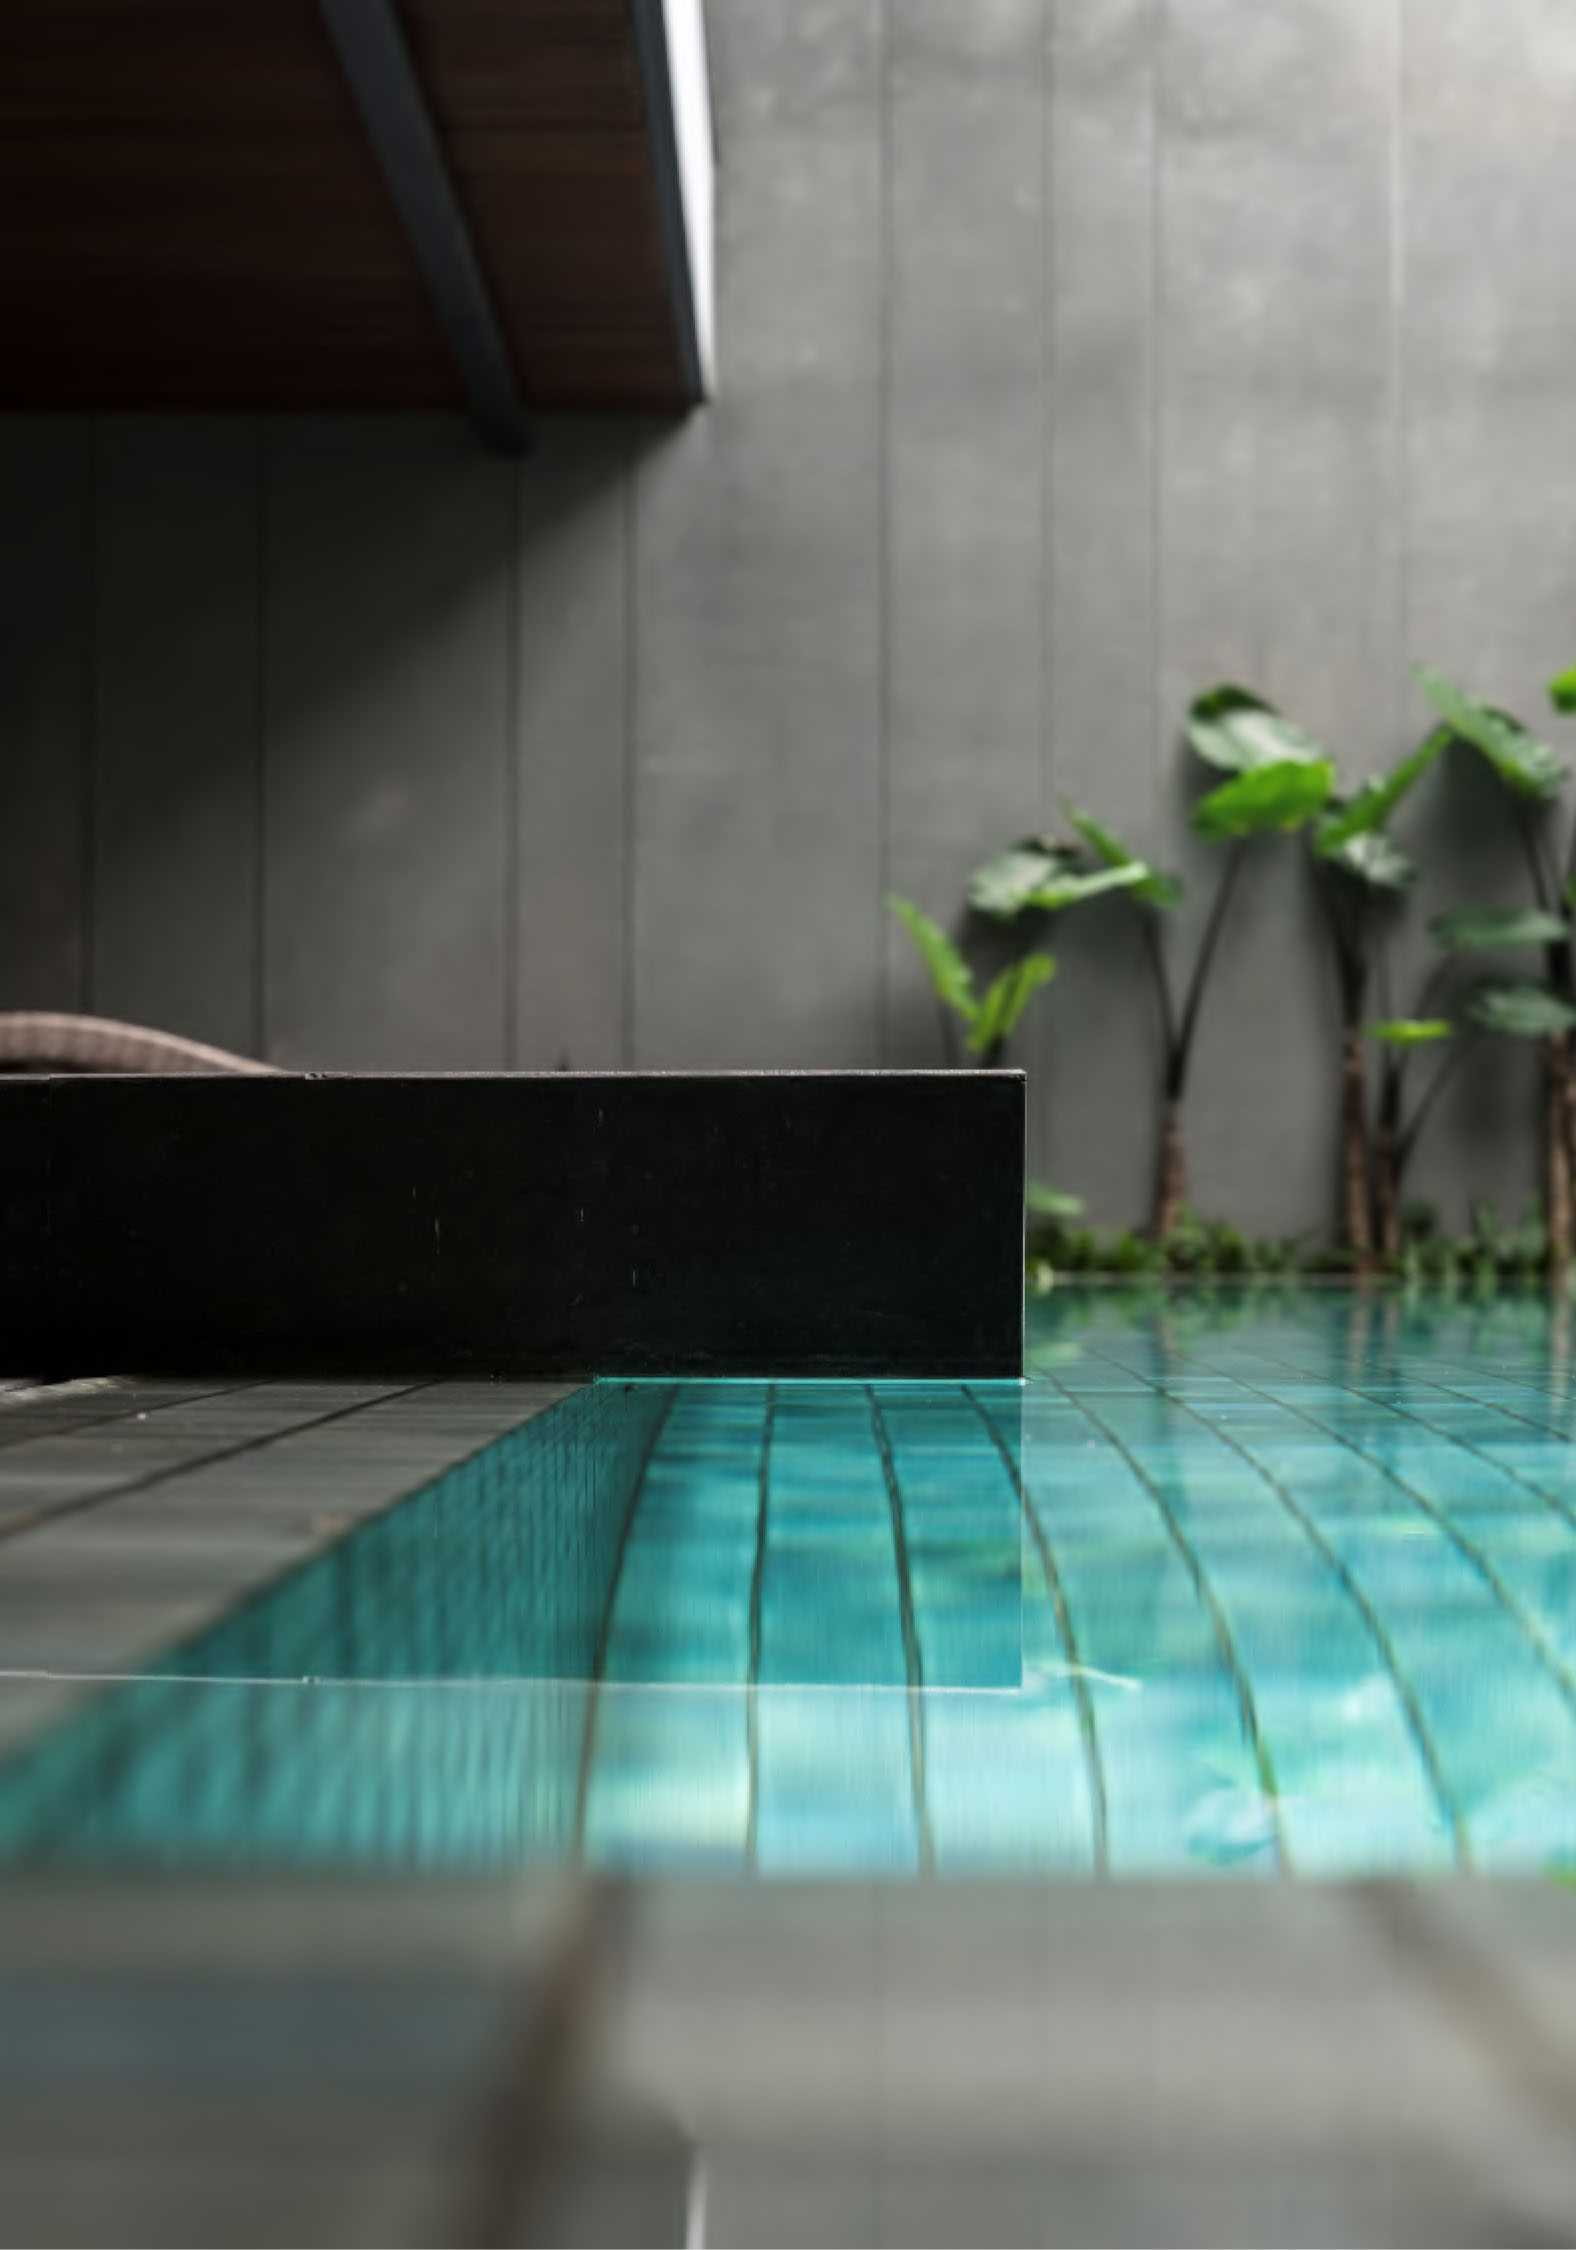 Studio Air Putih Ik_House Pondok Indah, Jakarta, Indonesia Pondok Indah, Jakarta, Indonesia Swimming Pool Kontemporer  25194